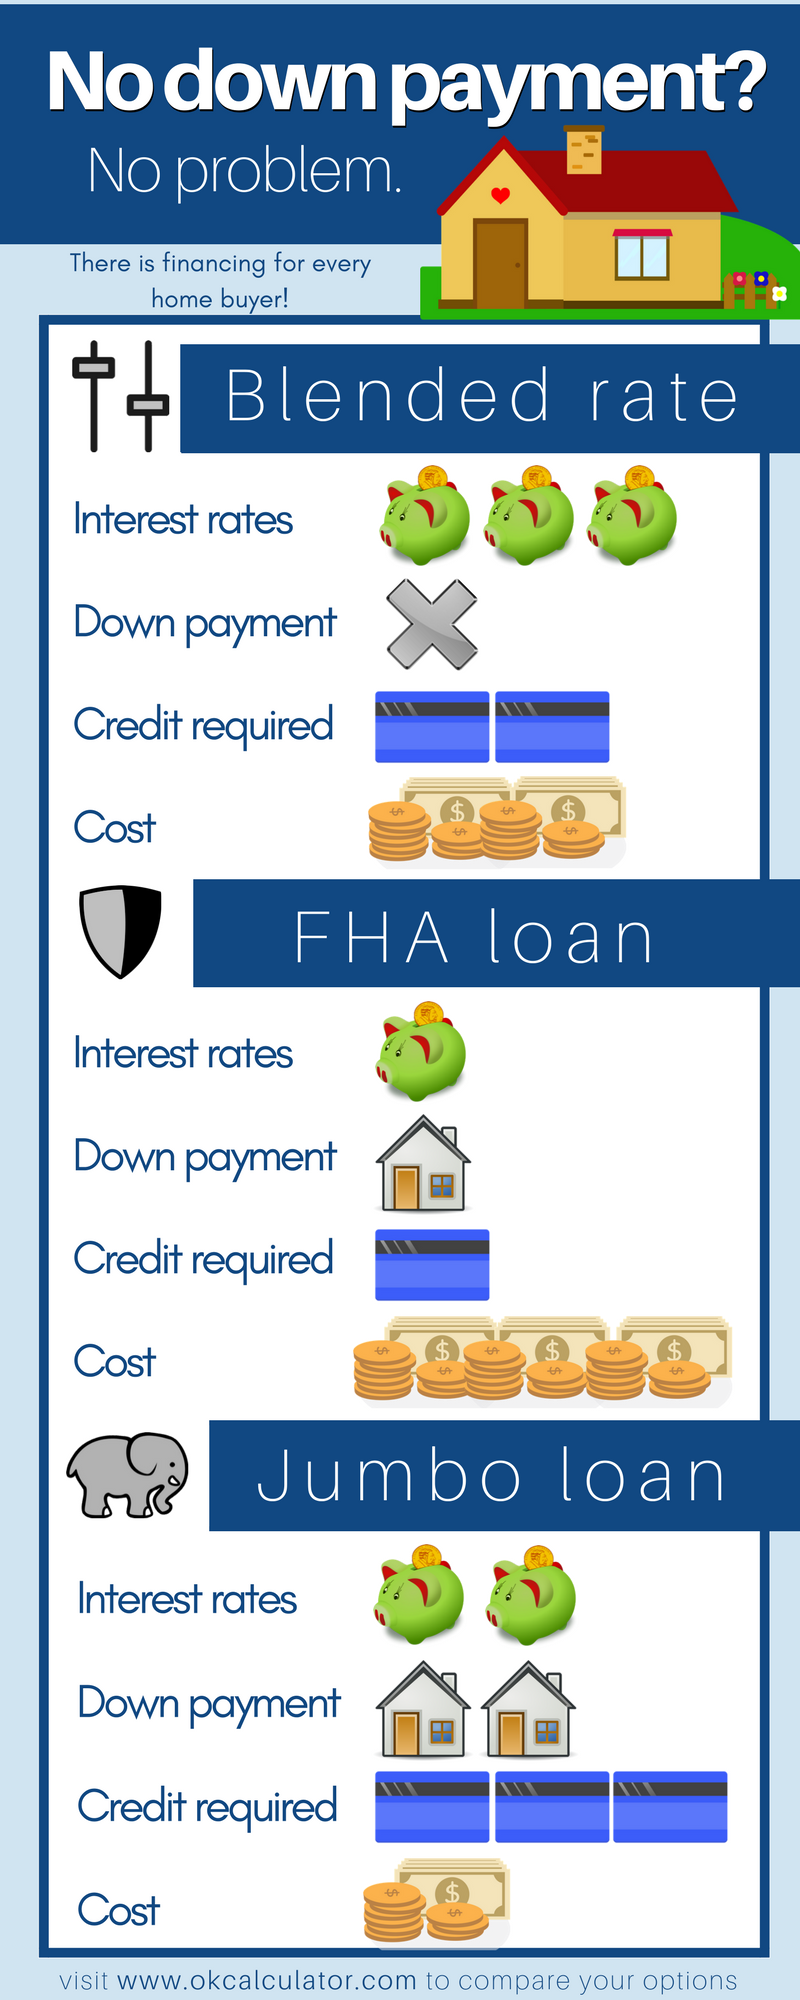 Fha Loan Calculator For Maryland Fha Loans Fha Loan Calculator